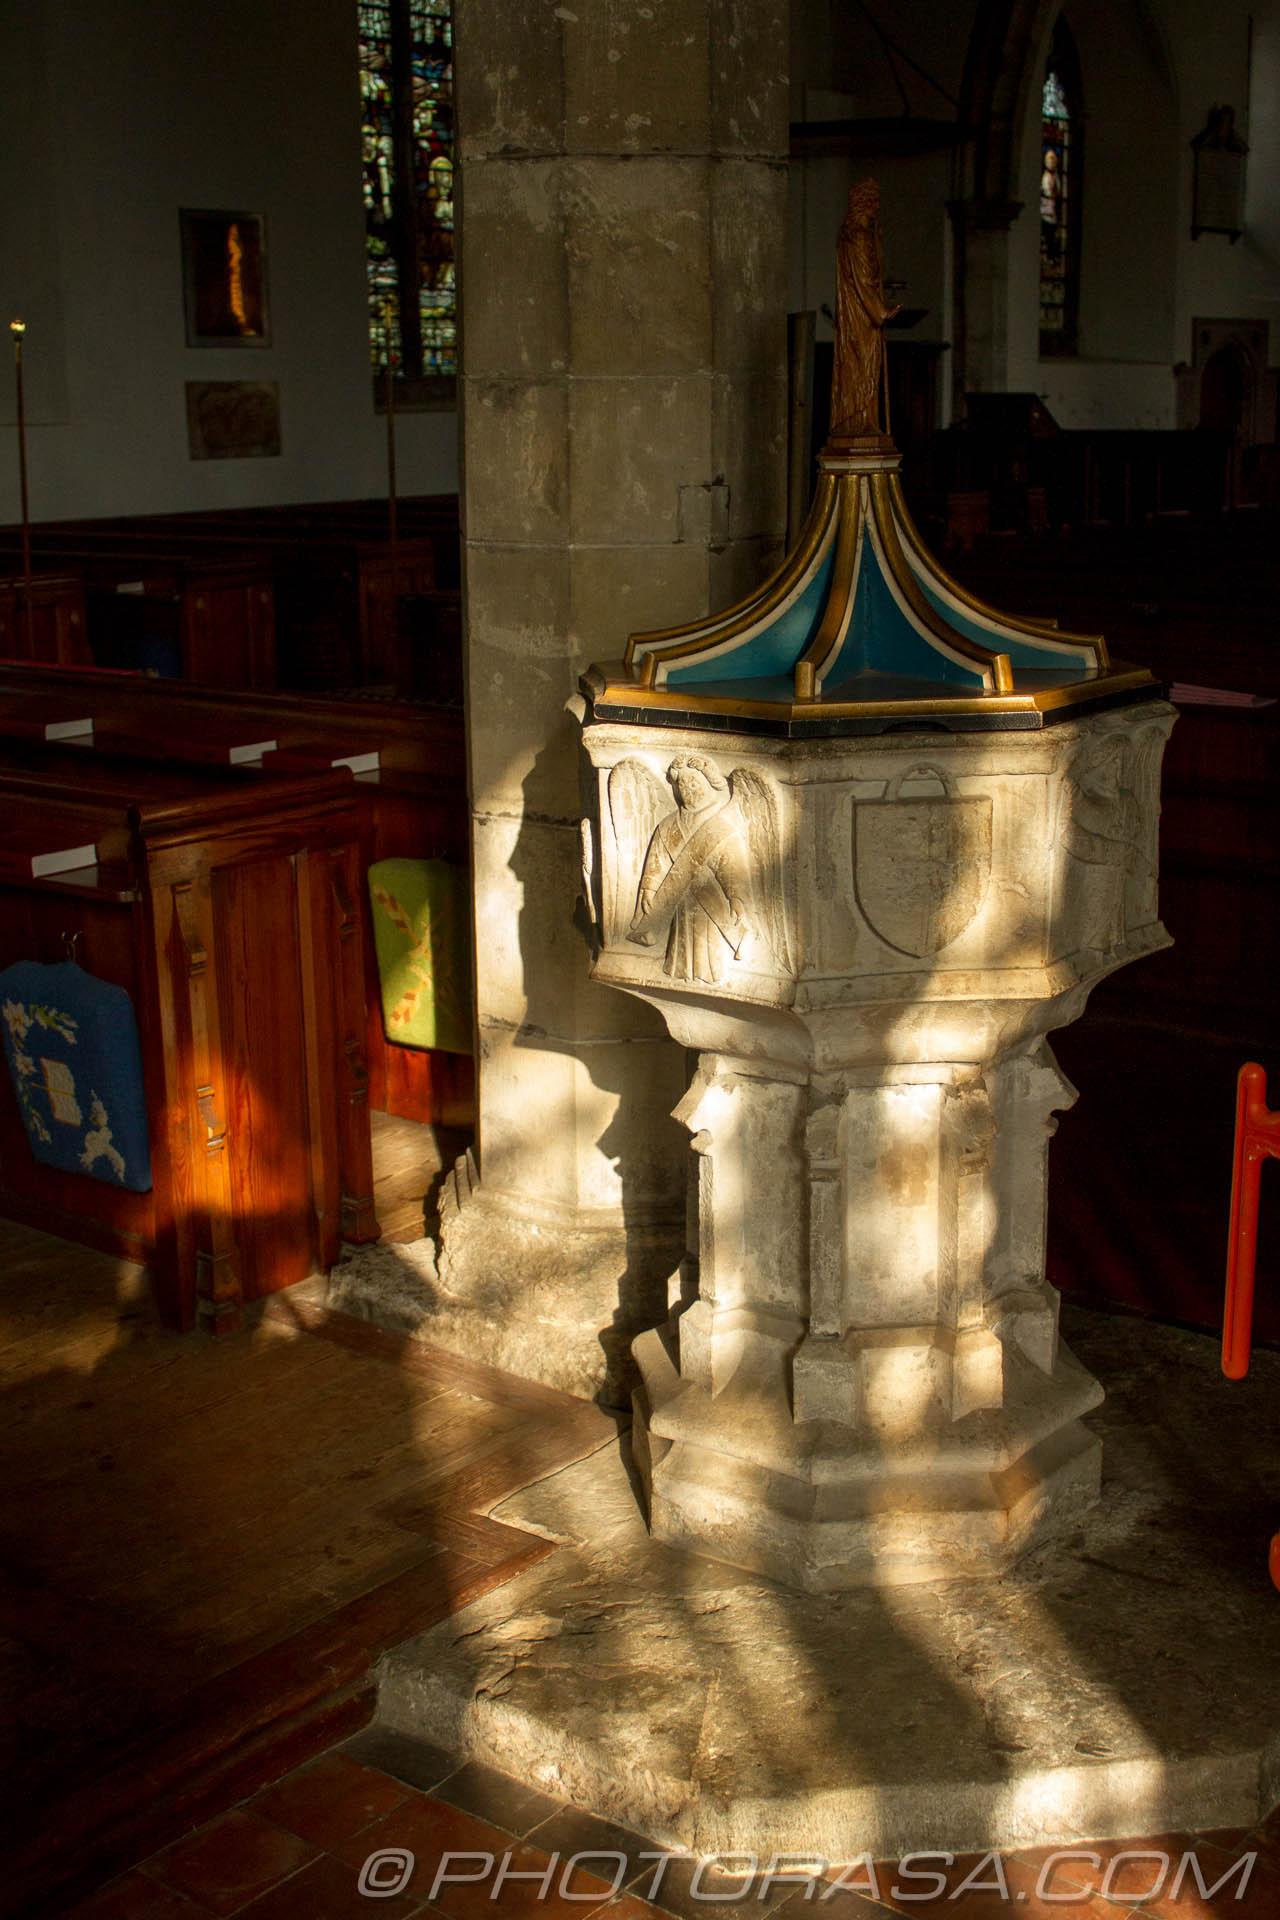 http://photorasa.com/parish-church-st-peter-st-paul-headcorn/sun-cast-through-windows-on-14th-century-church-font/